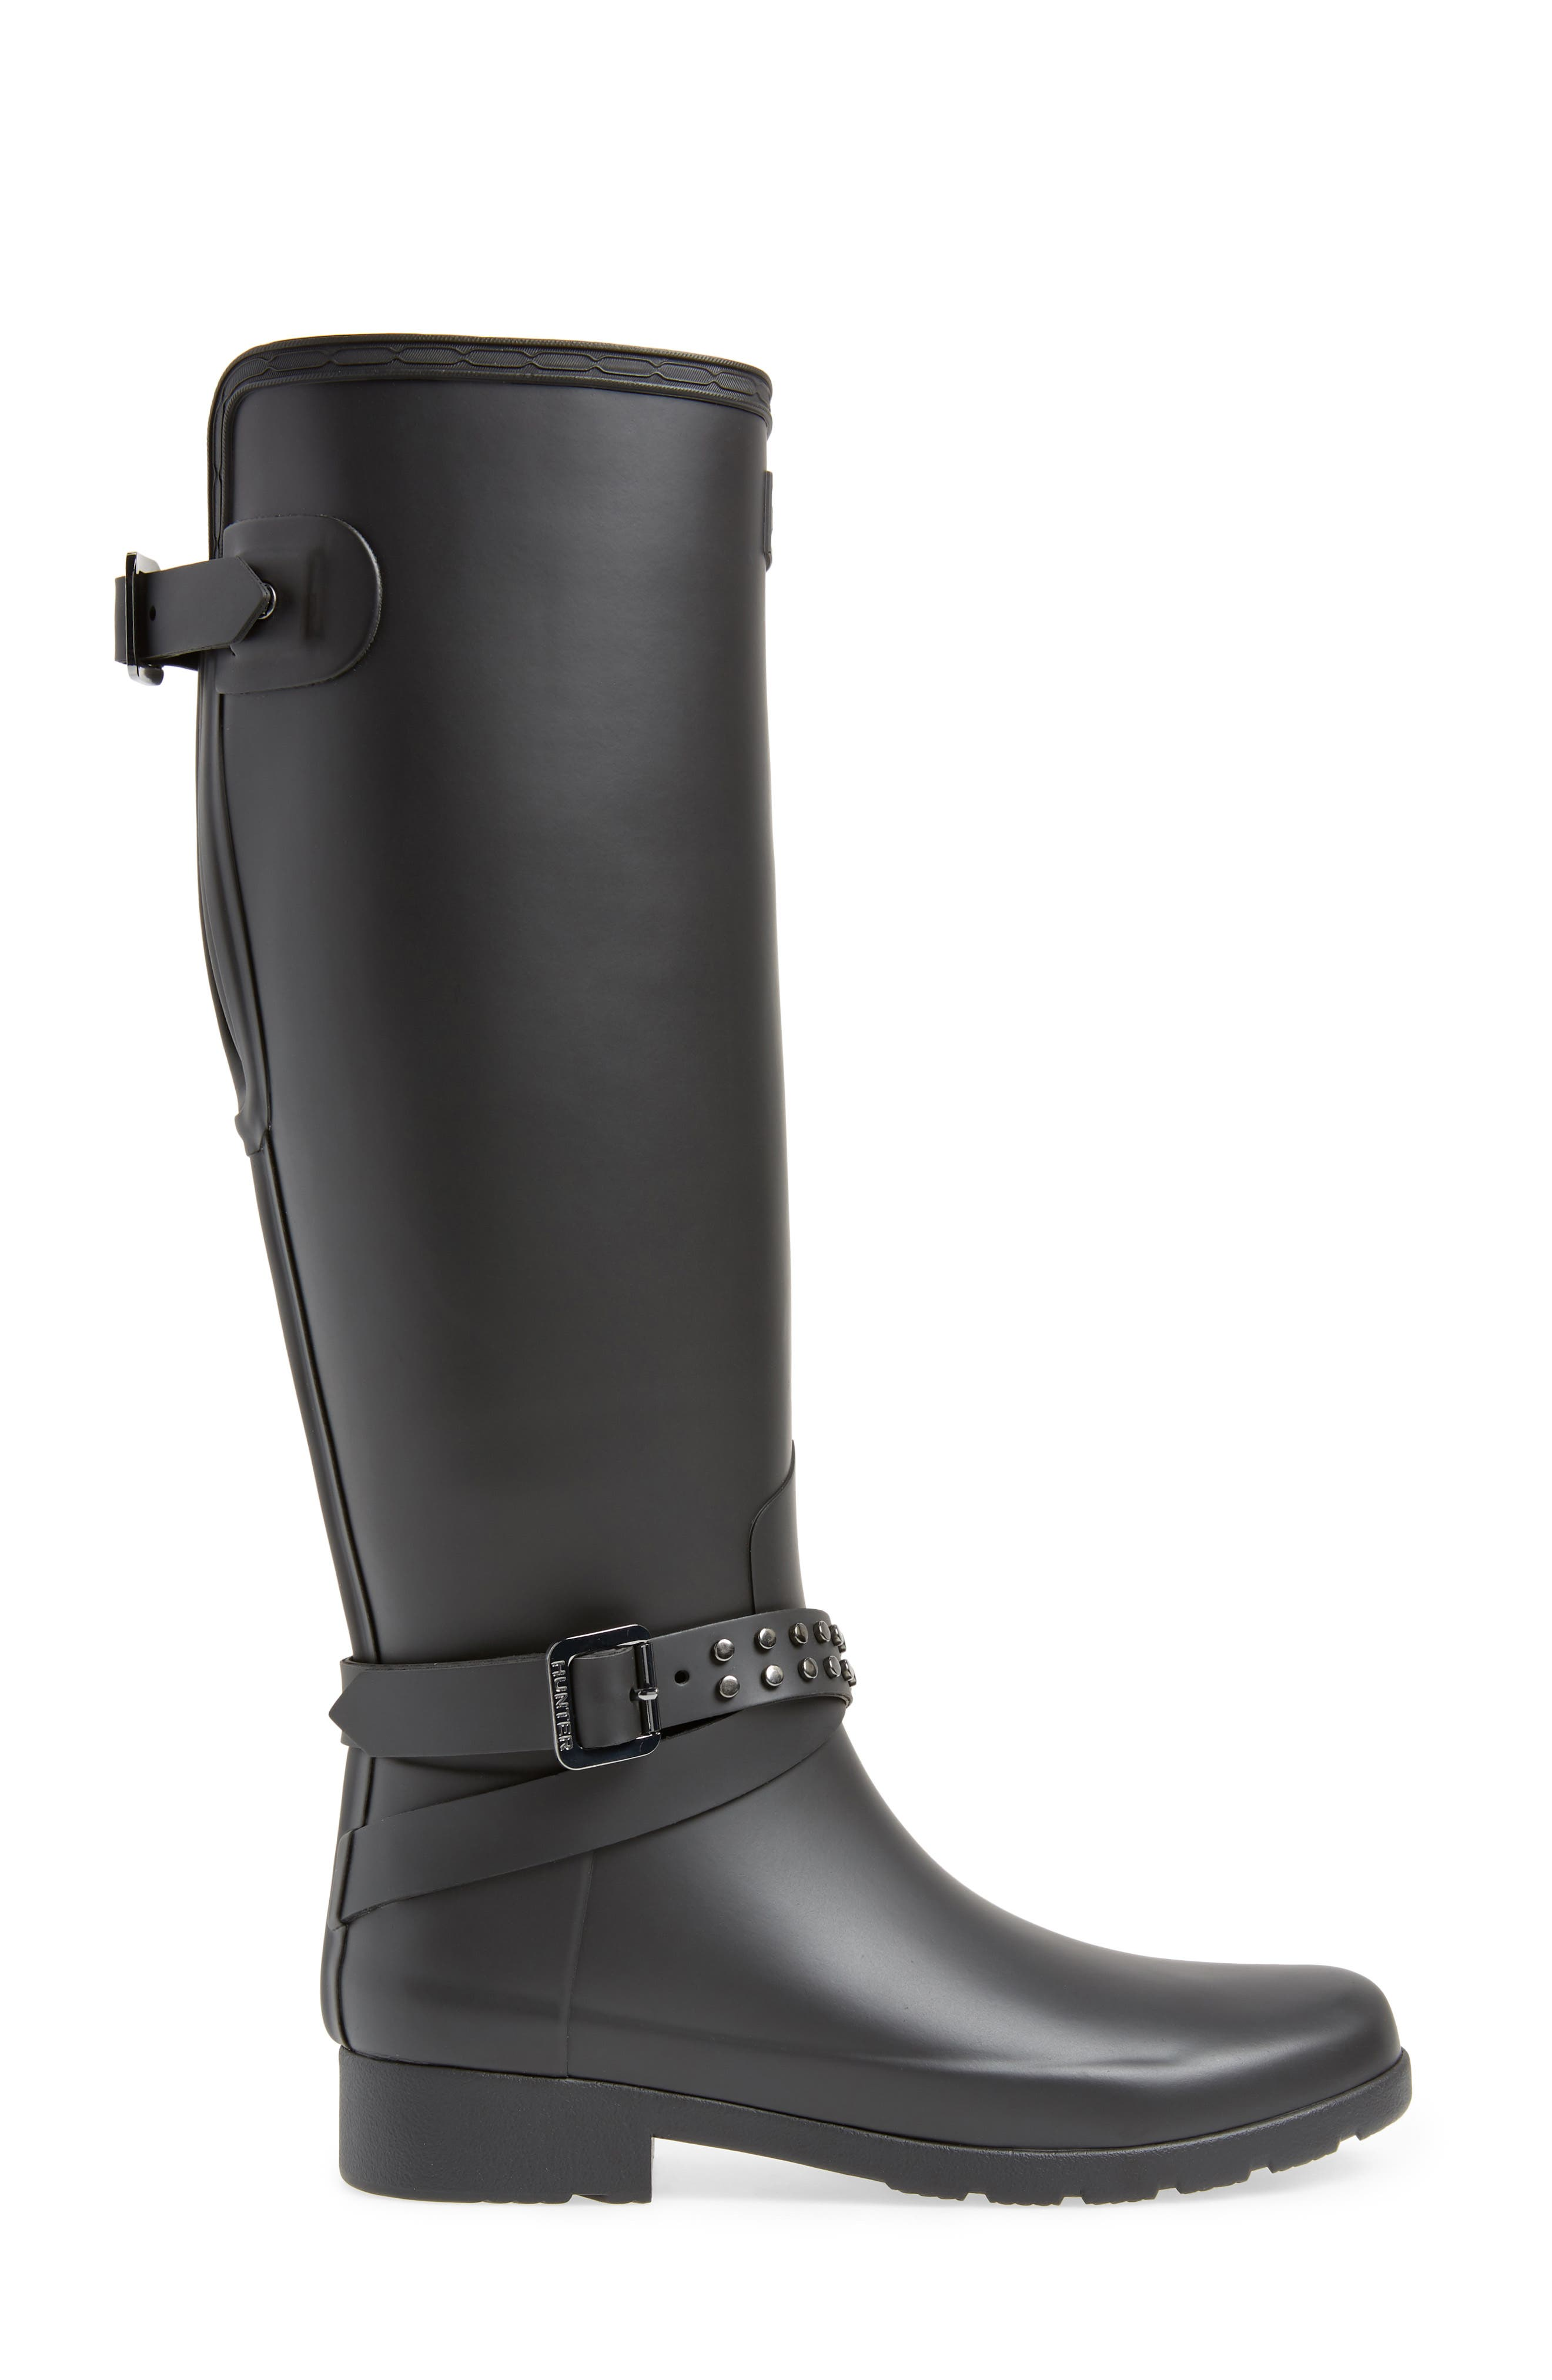 HUNTER, Refined Adjustable Back Knee High Waterproof Rain Boot, Alternate thumbnail 3, color, BLACK